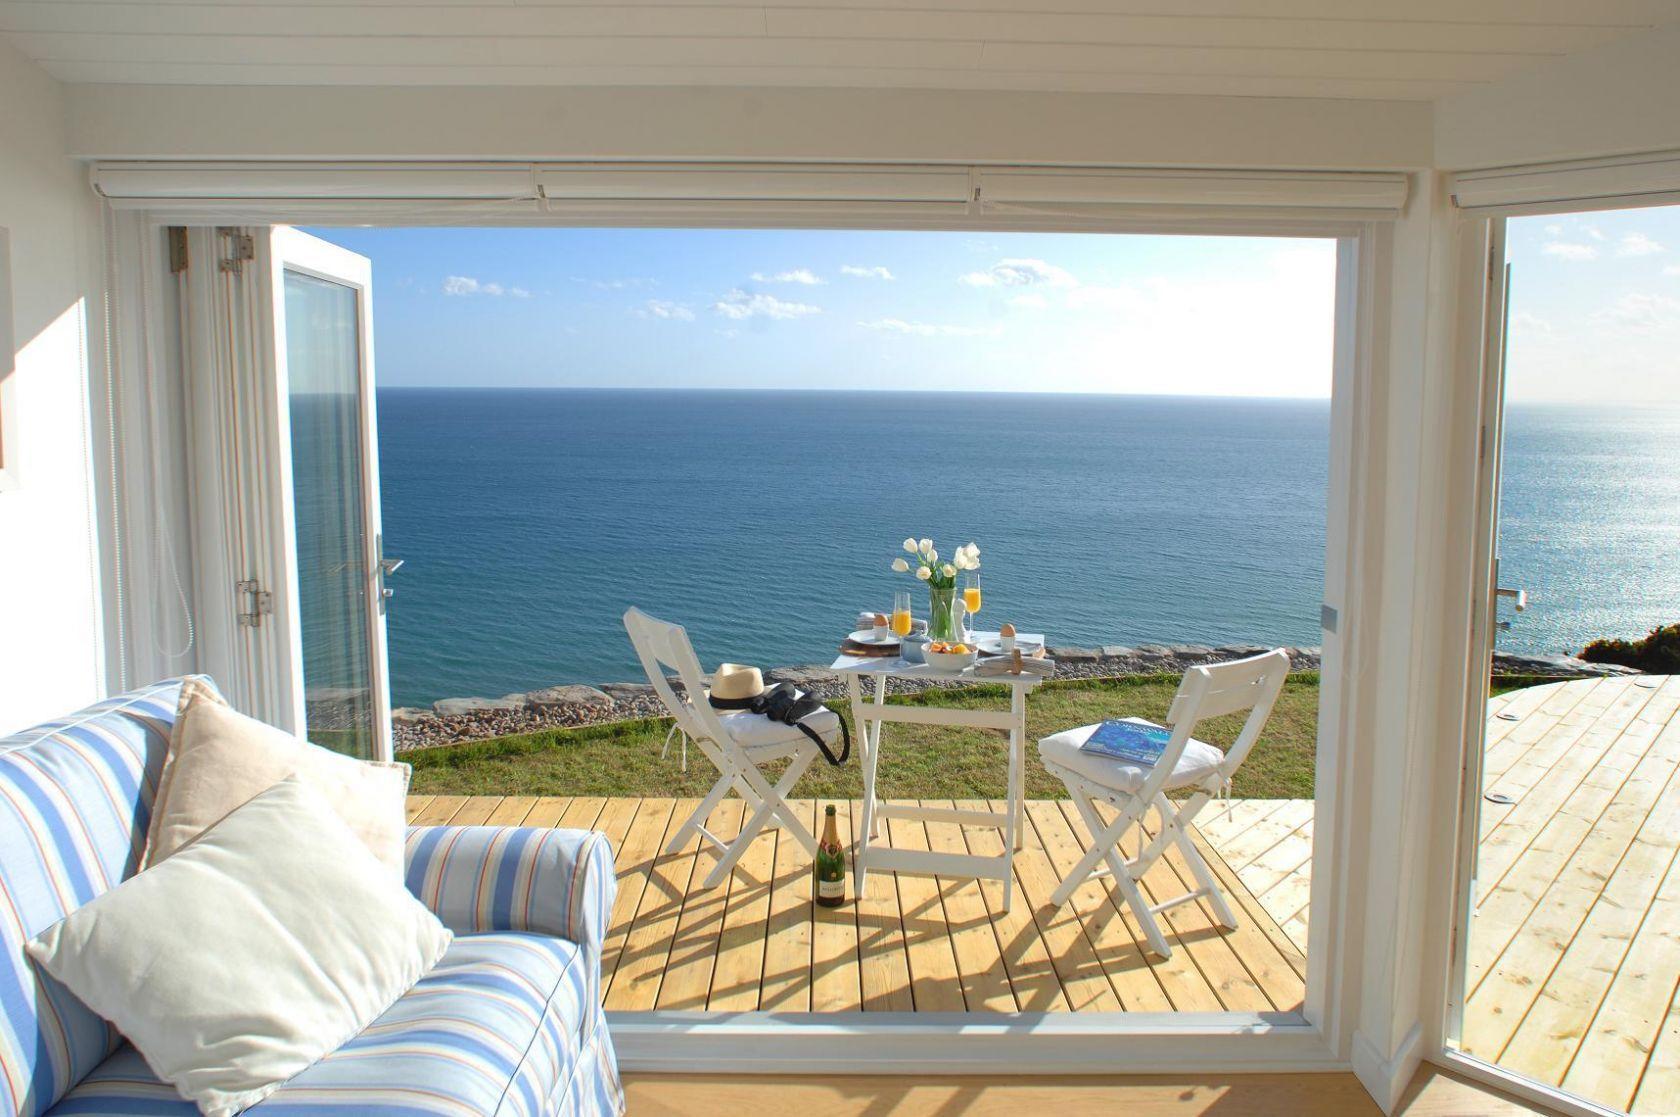 beach house   living room   terrace   open to ocean